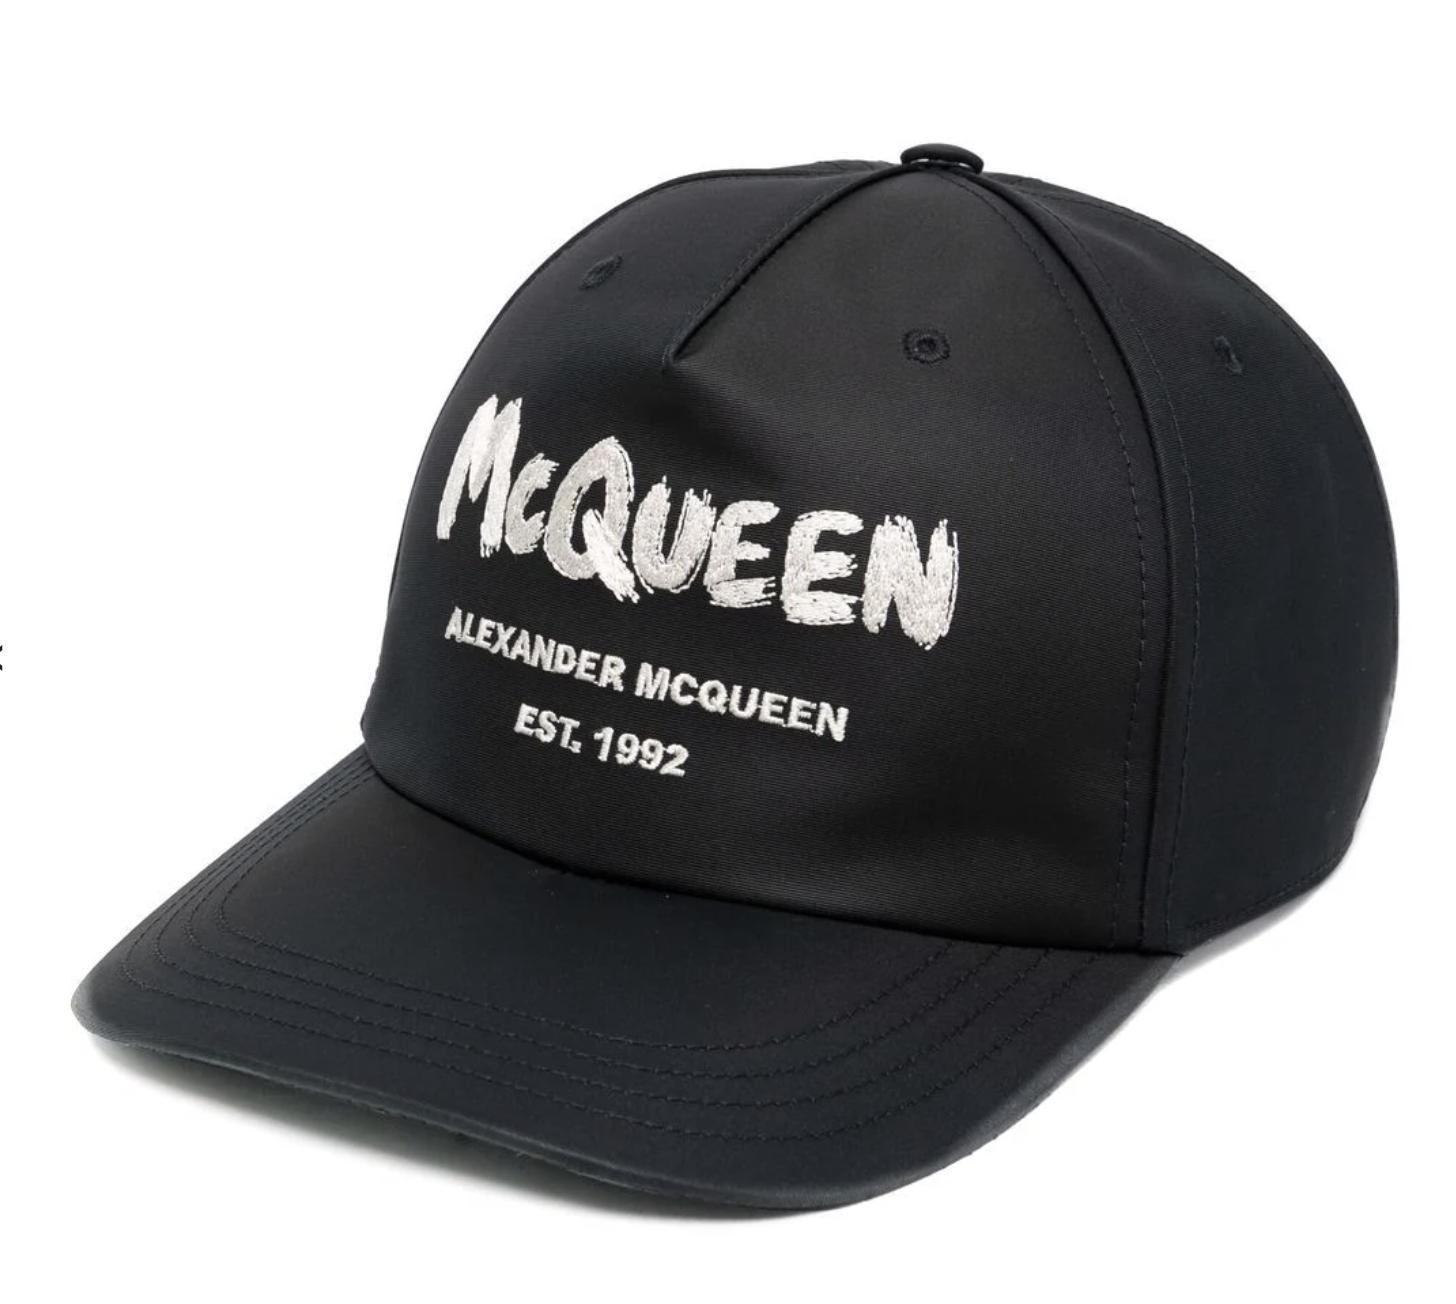 Gorra de Alexander McQueen